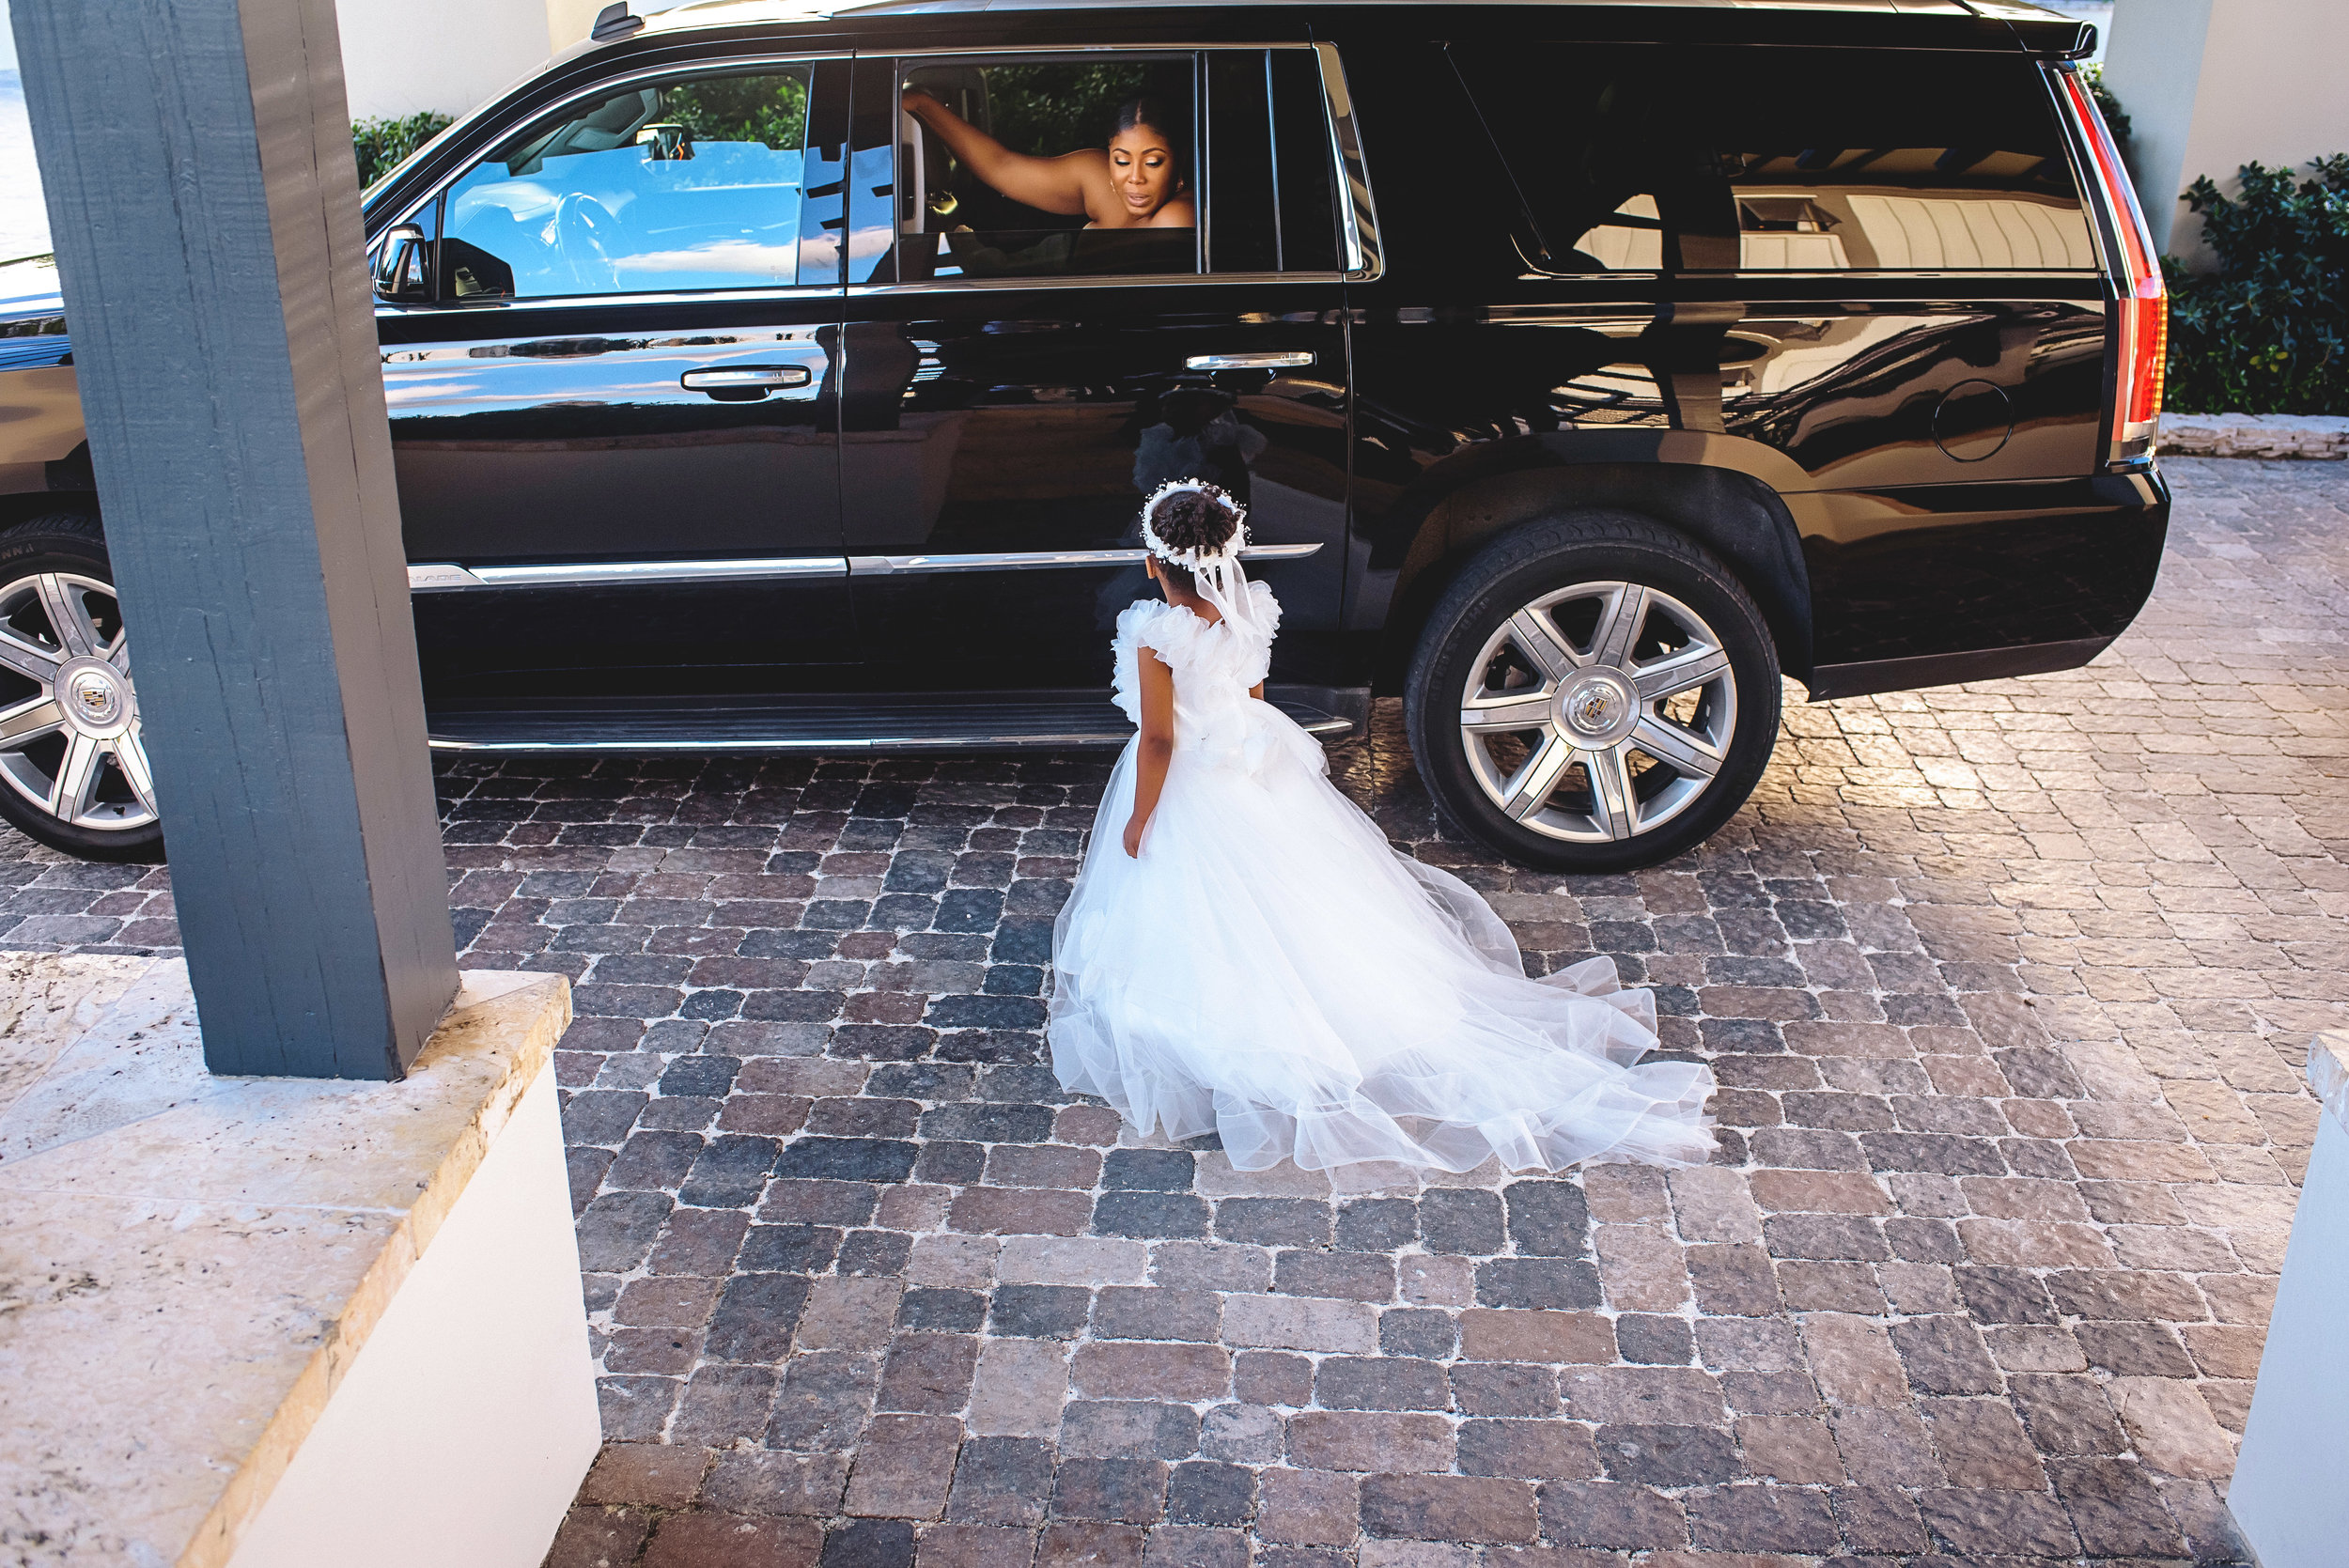 2017-11-17-Wedding-Jide Alakija-Nassua-Robert and Colette-02619.jpg